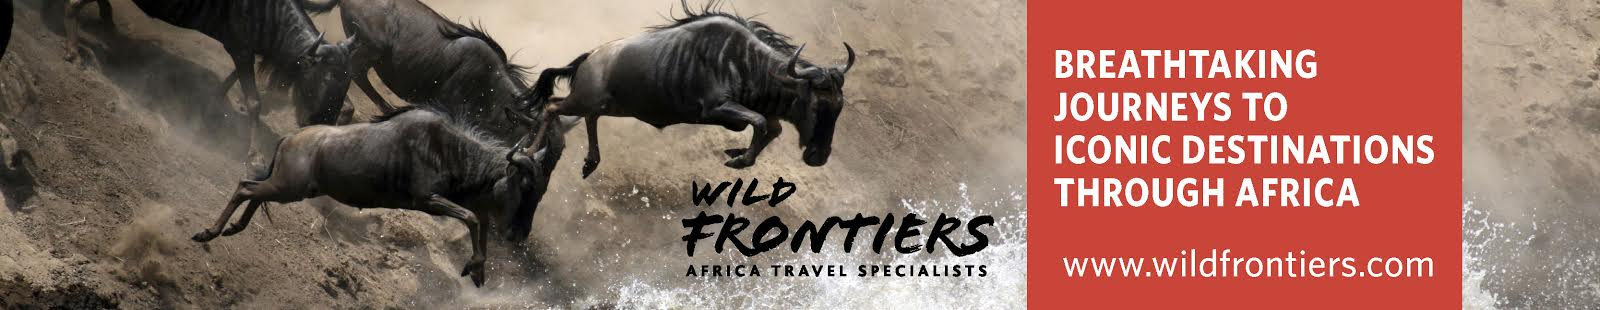 Tanzani wild frontiers